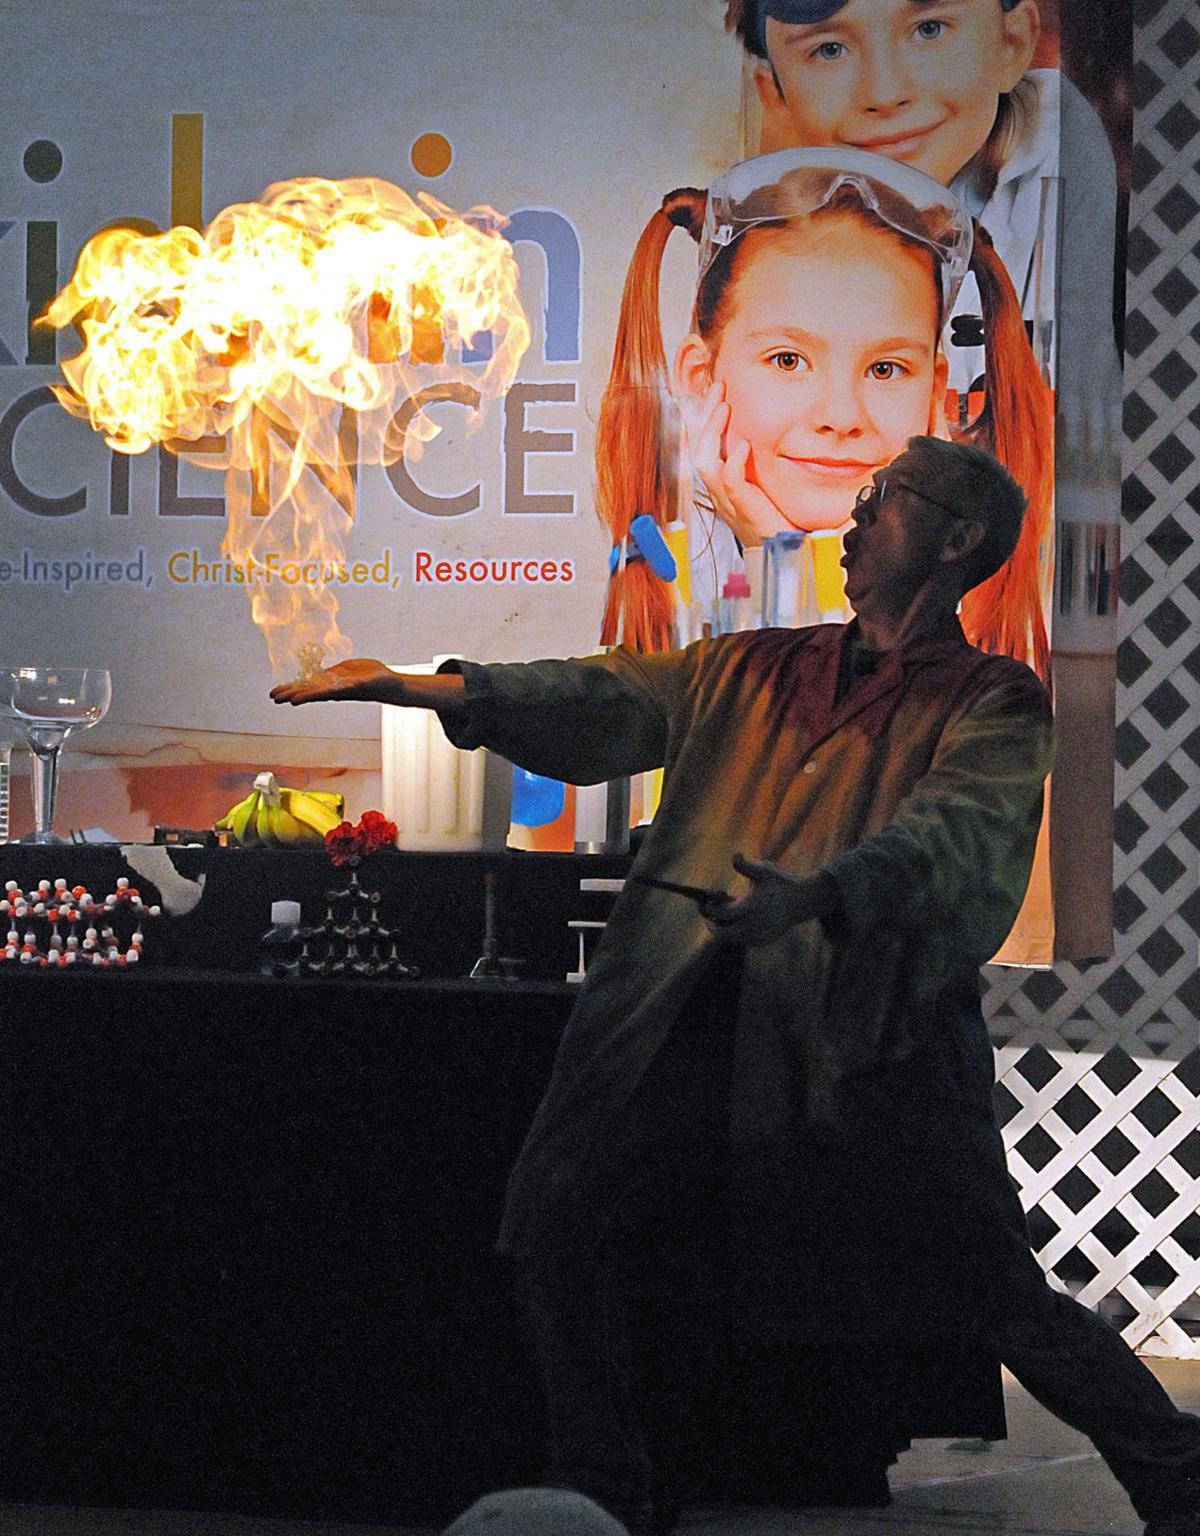 Eric Amazing Chemestry Show.jpg